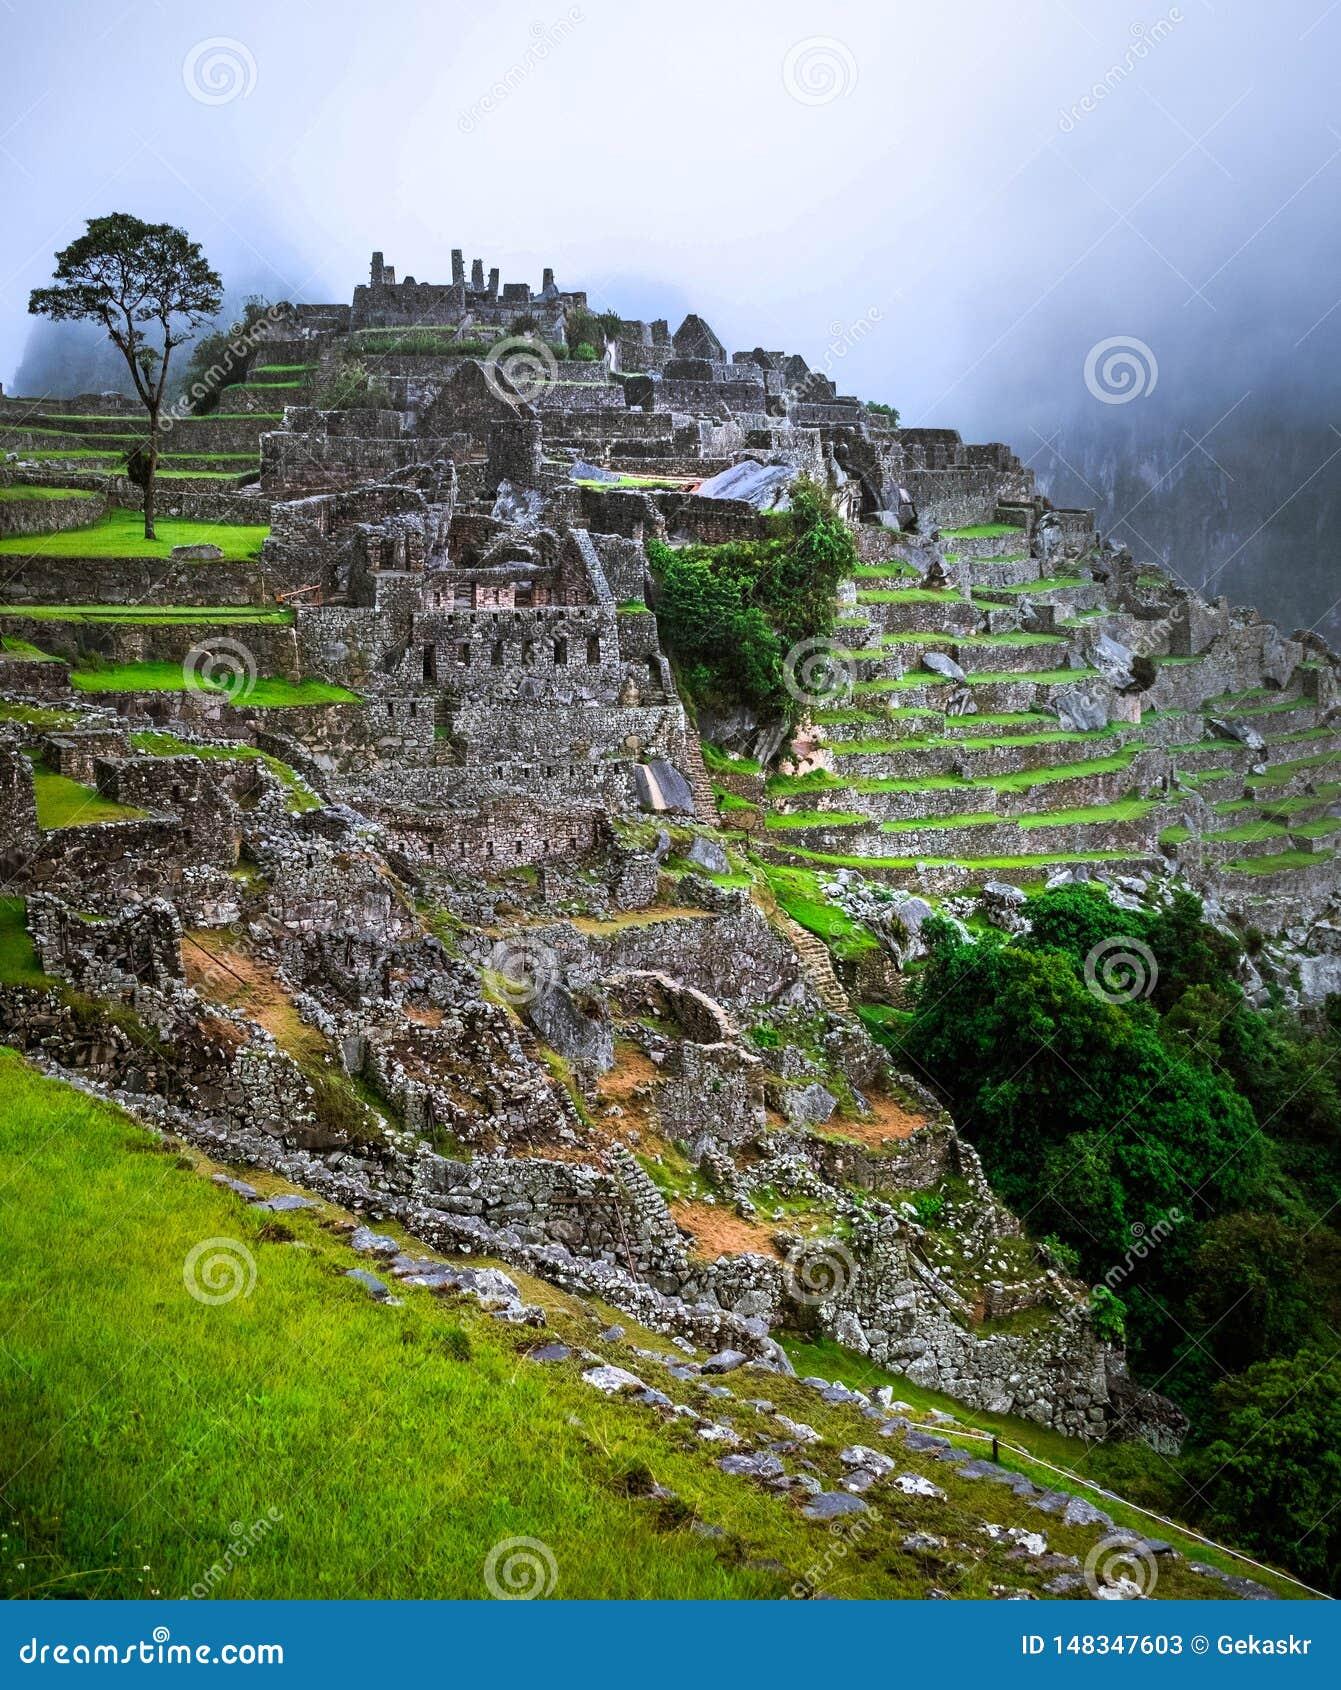 Machupicchu Temple Landscape Stock Image - Image of ...